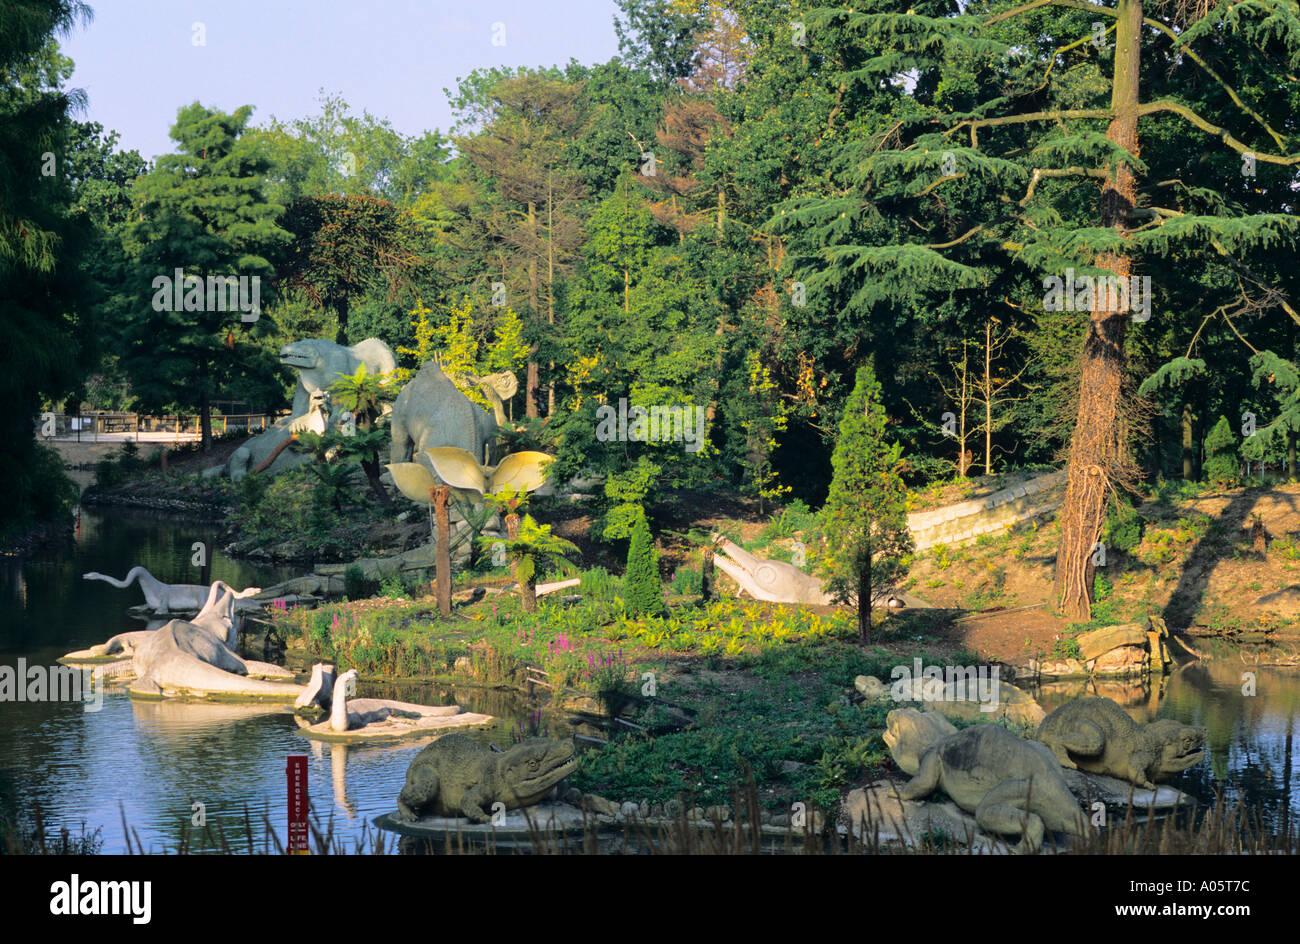 Newly restored Dinosaur models in Crystal Palace Park Sydenham London UK - Stock Image